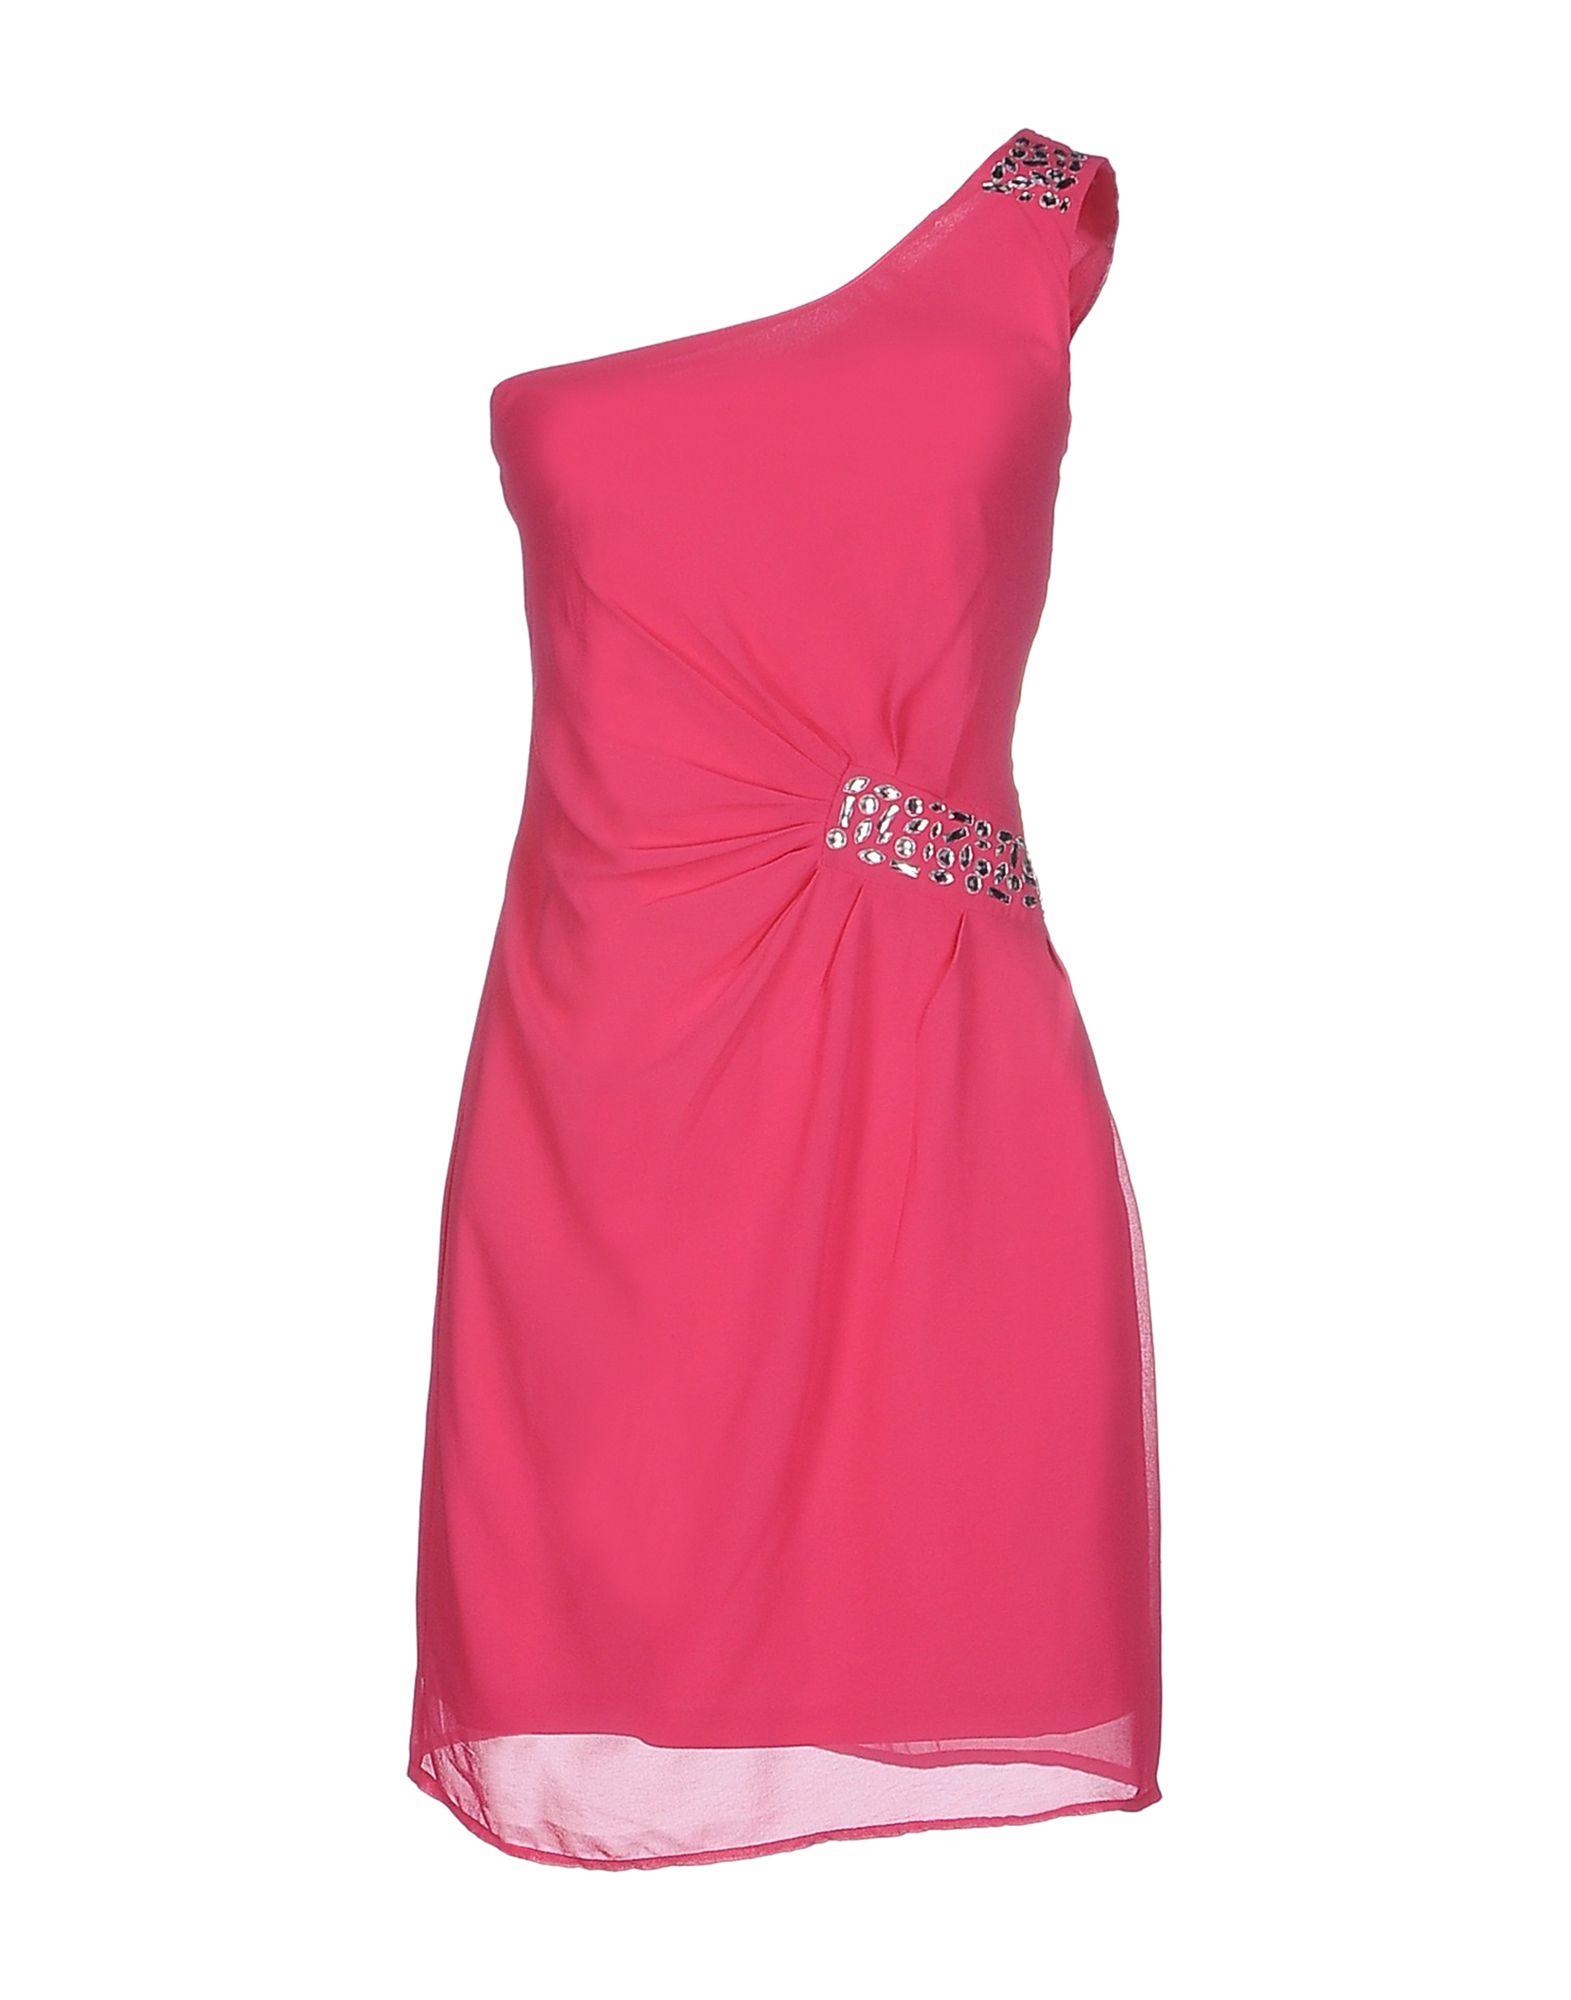 vero moda short dress in pink lyst. Black Bedroom Furniture Sets. Home Design Ideas